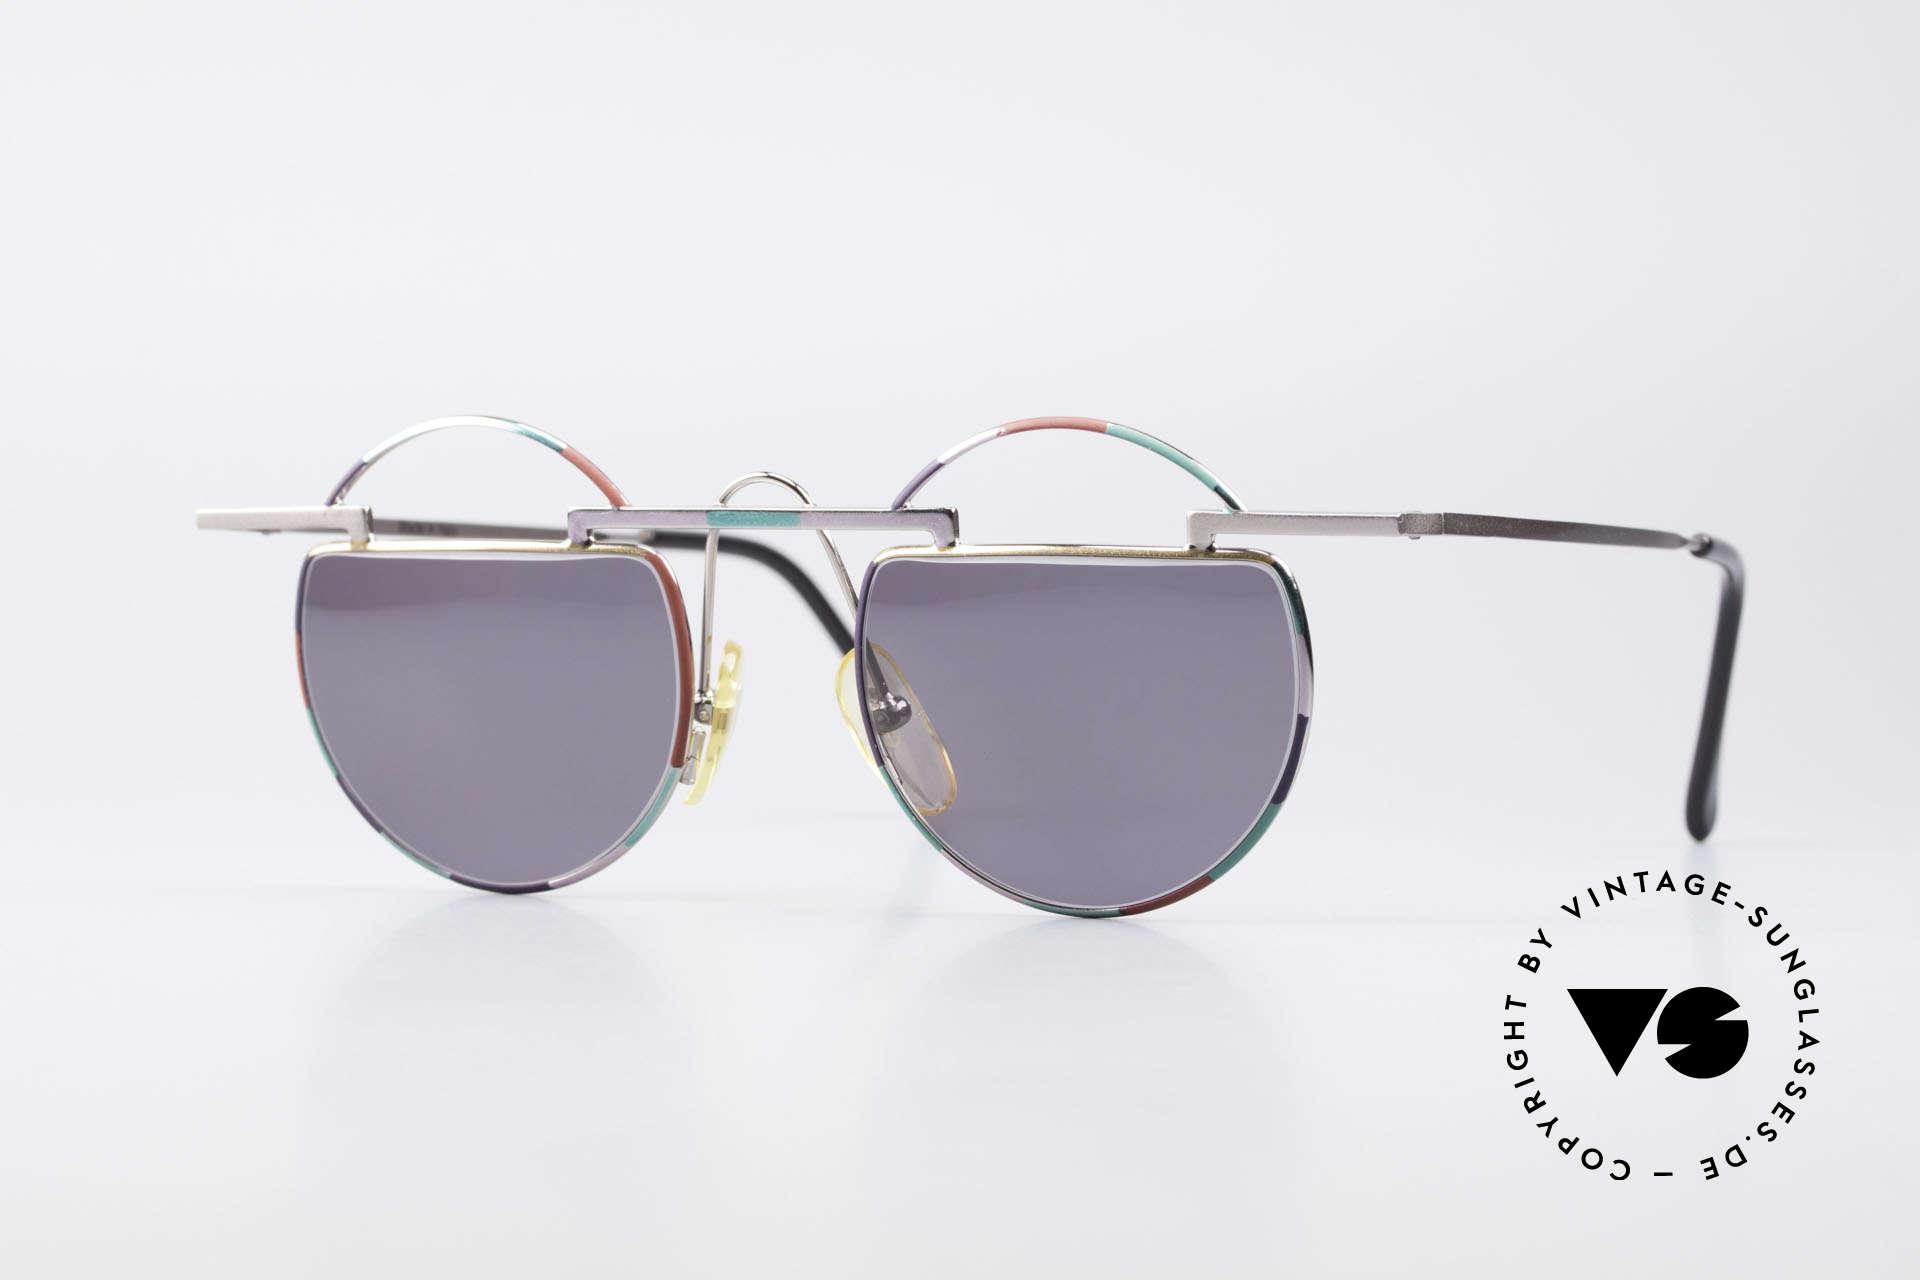 Taxi 221 by Casanova Vintage Art Sunglasses, artful TAXI by Casanova vintage shades of the 80's, Made for Women